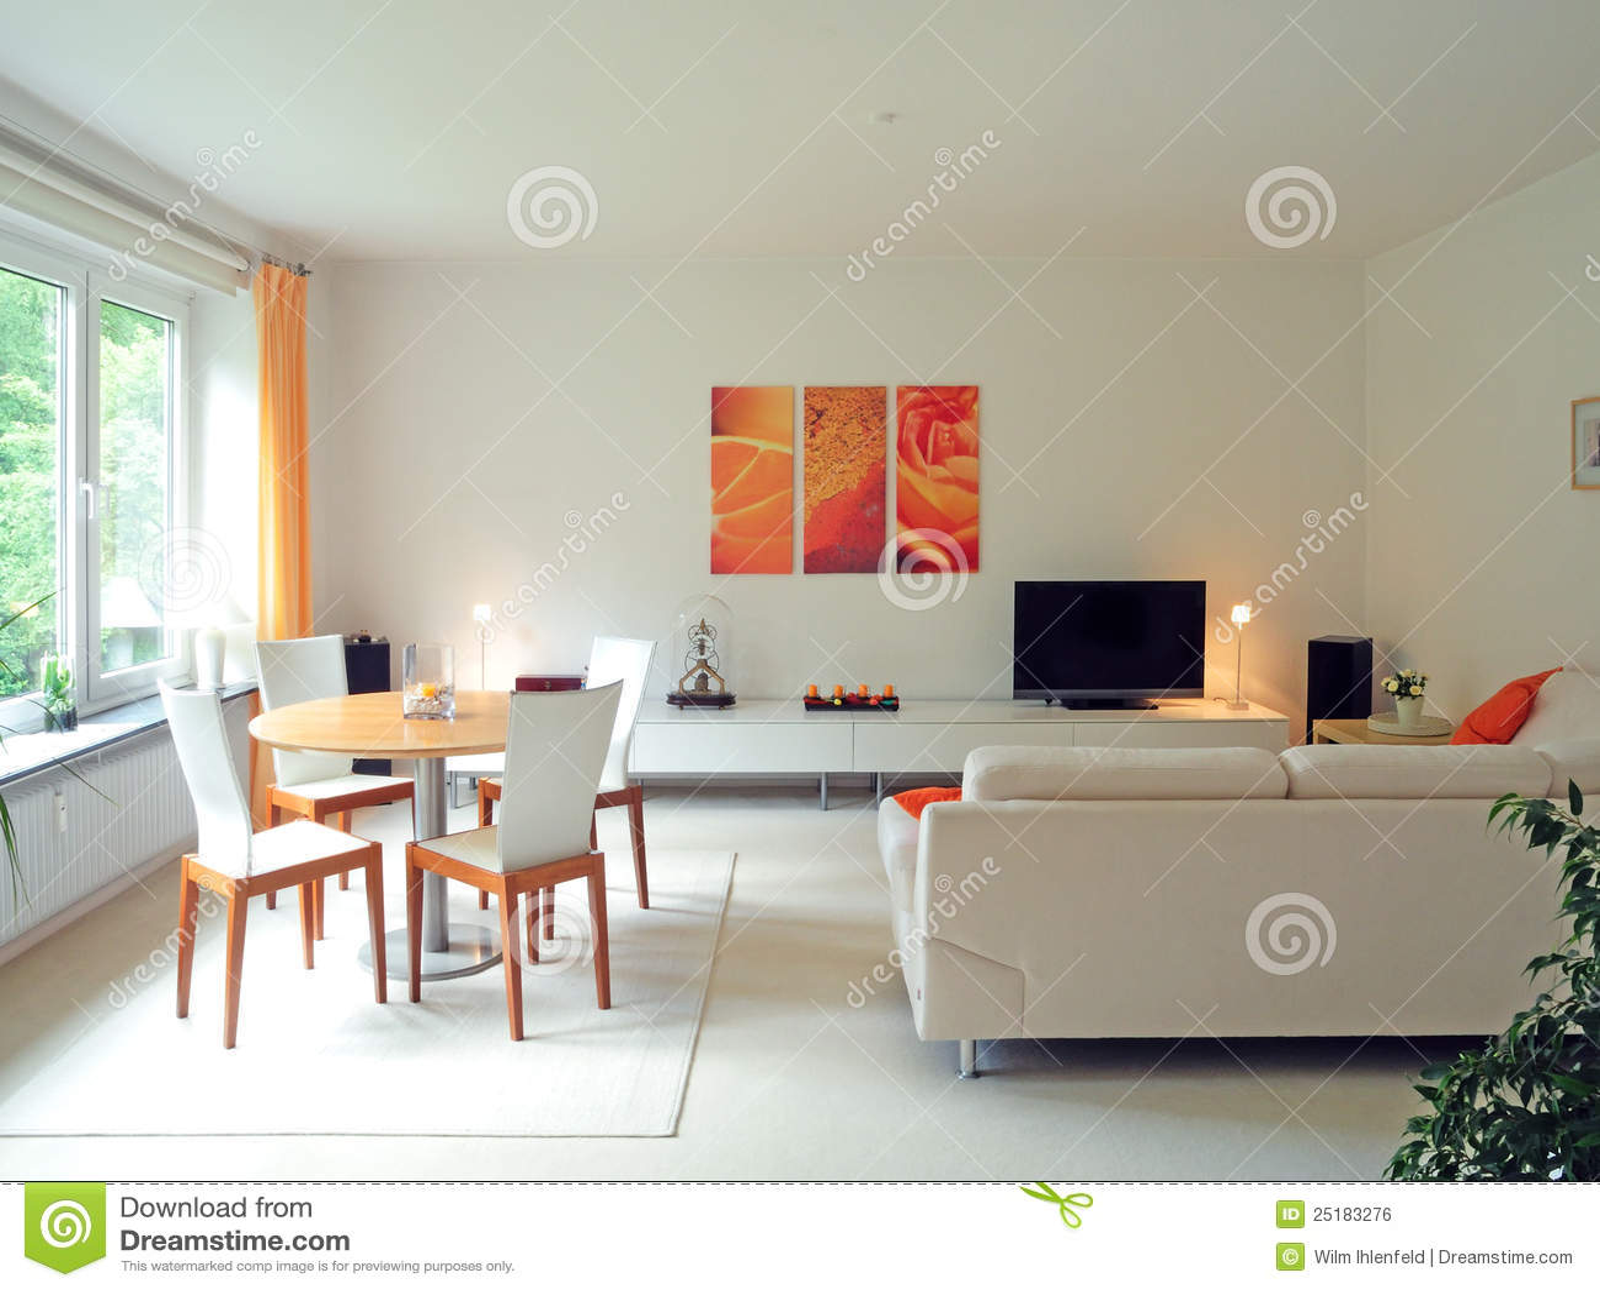 Moderne Woonkamer Royalty-vrije Stock Afbeelding - Afbeelding ...